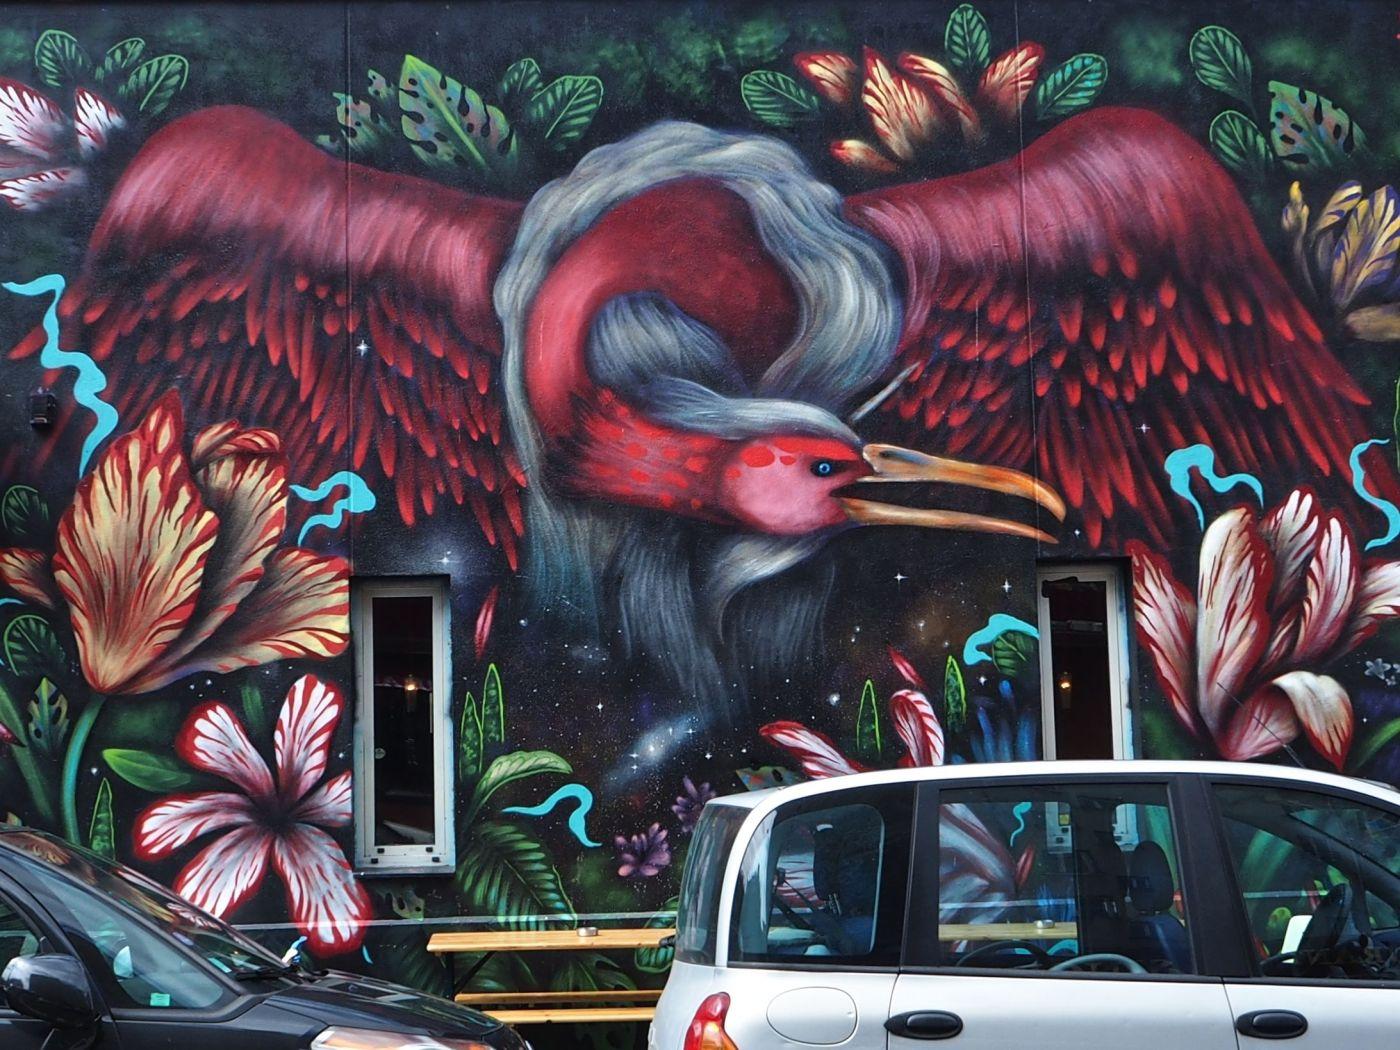 Baillon mural Paris